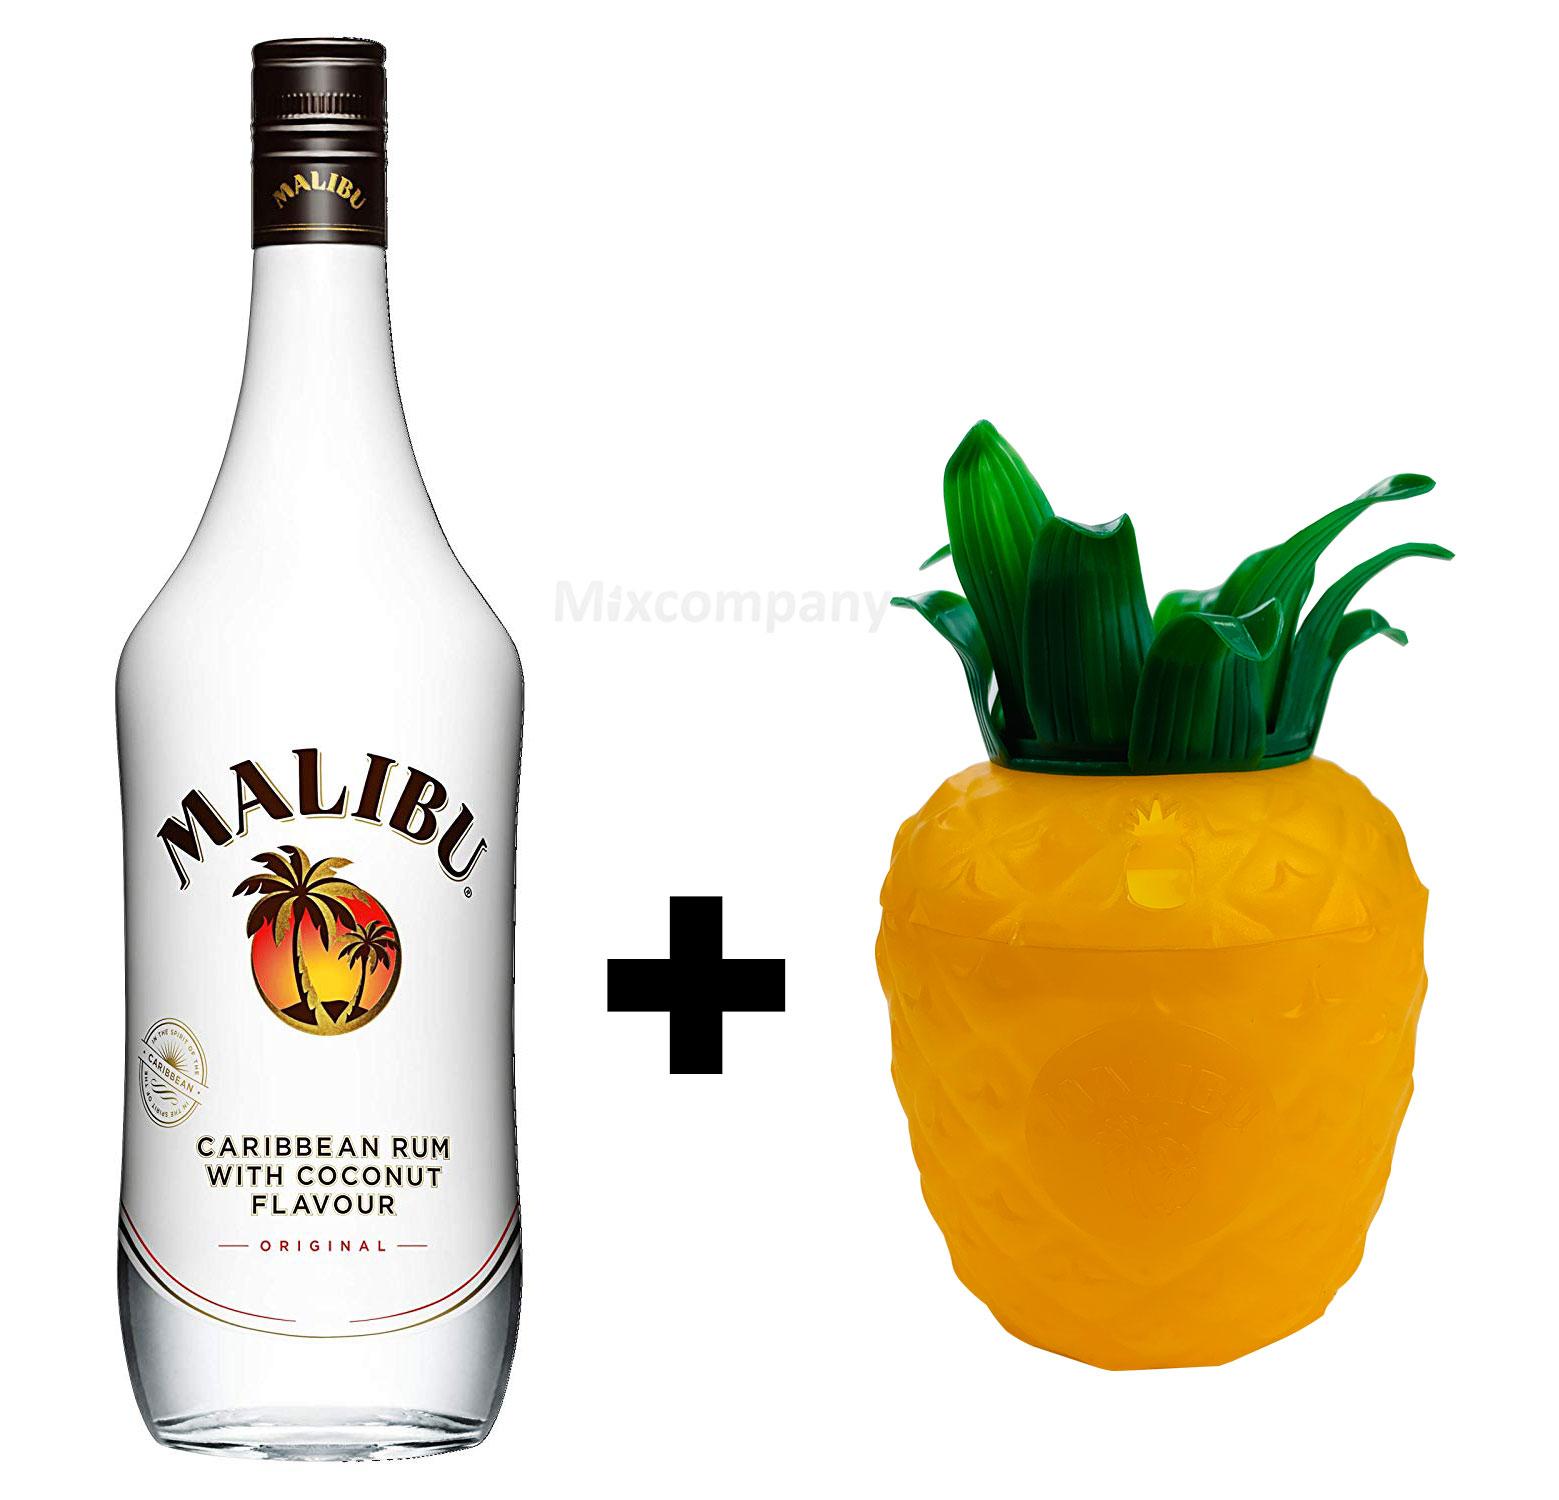 Malibu Karibik Rum Kokos Aroma 0,7l 700ml (21% Vol) Caribbean Kokosrum + Malibu Cocktail Becher aus Kunststoff ananasform gelb ca. 0,3l 300ml Mehrweg Trinkbecher Cocktailbecher Ananas Glas Gläser- [Enthält Sulfite]